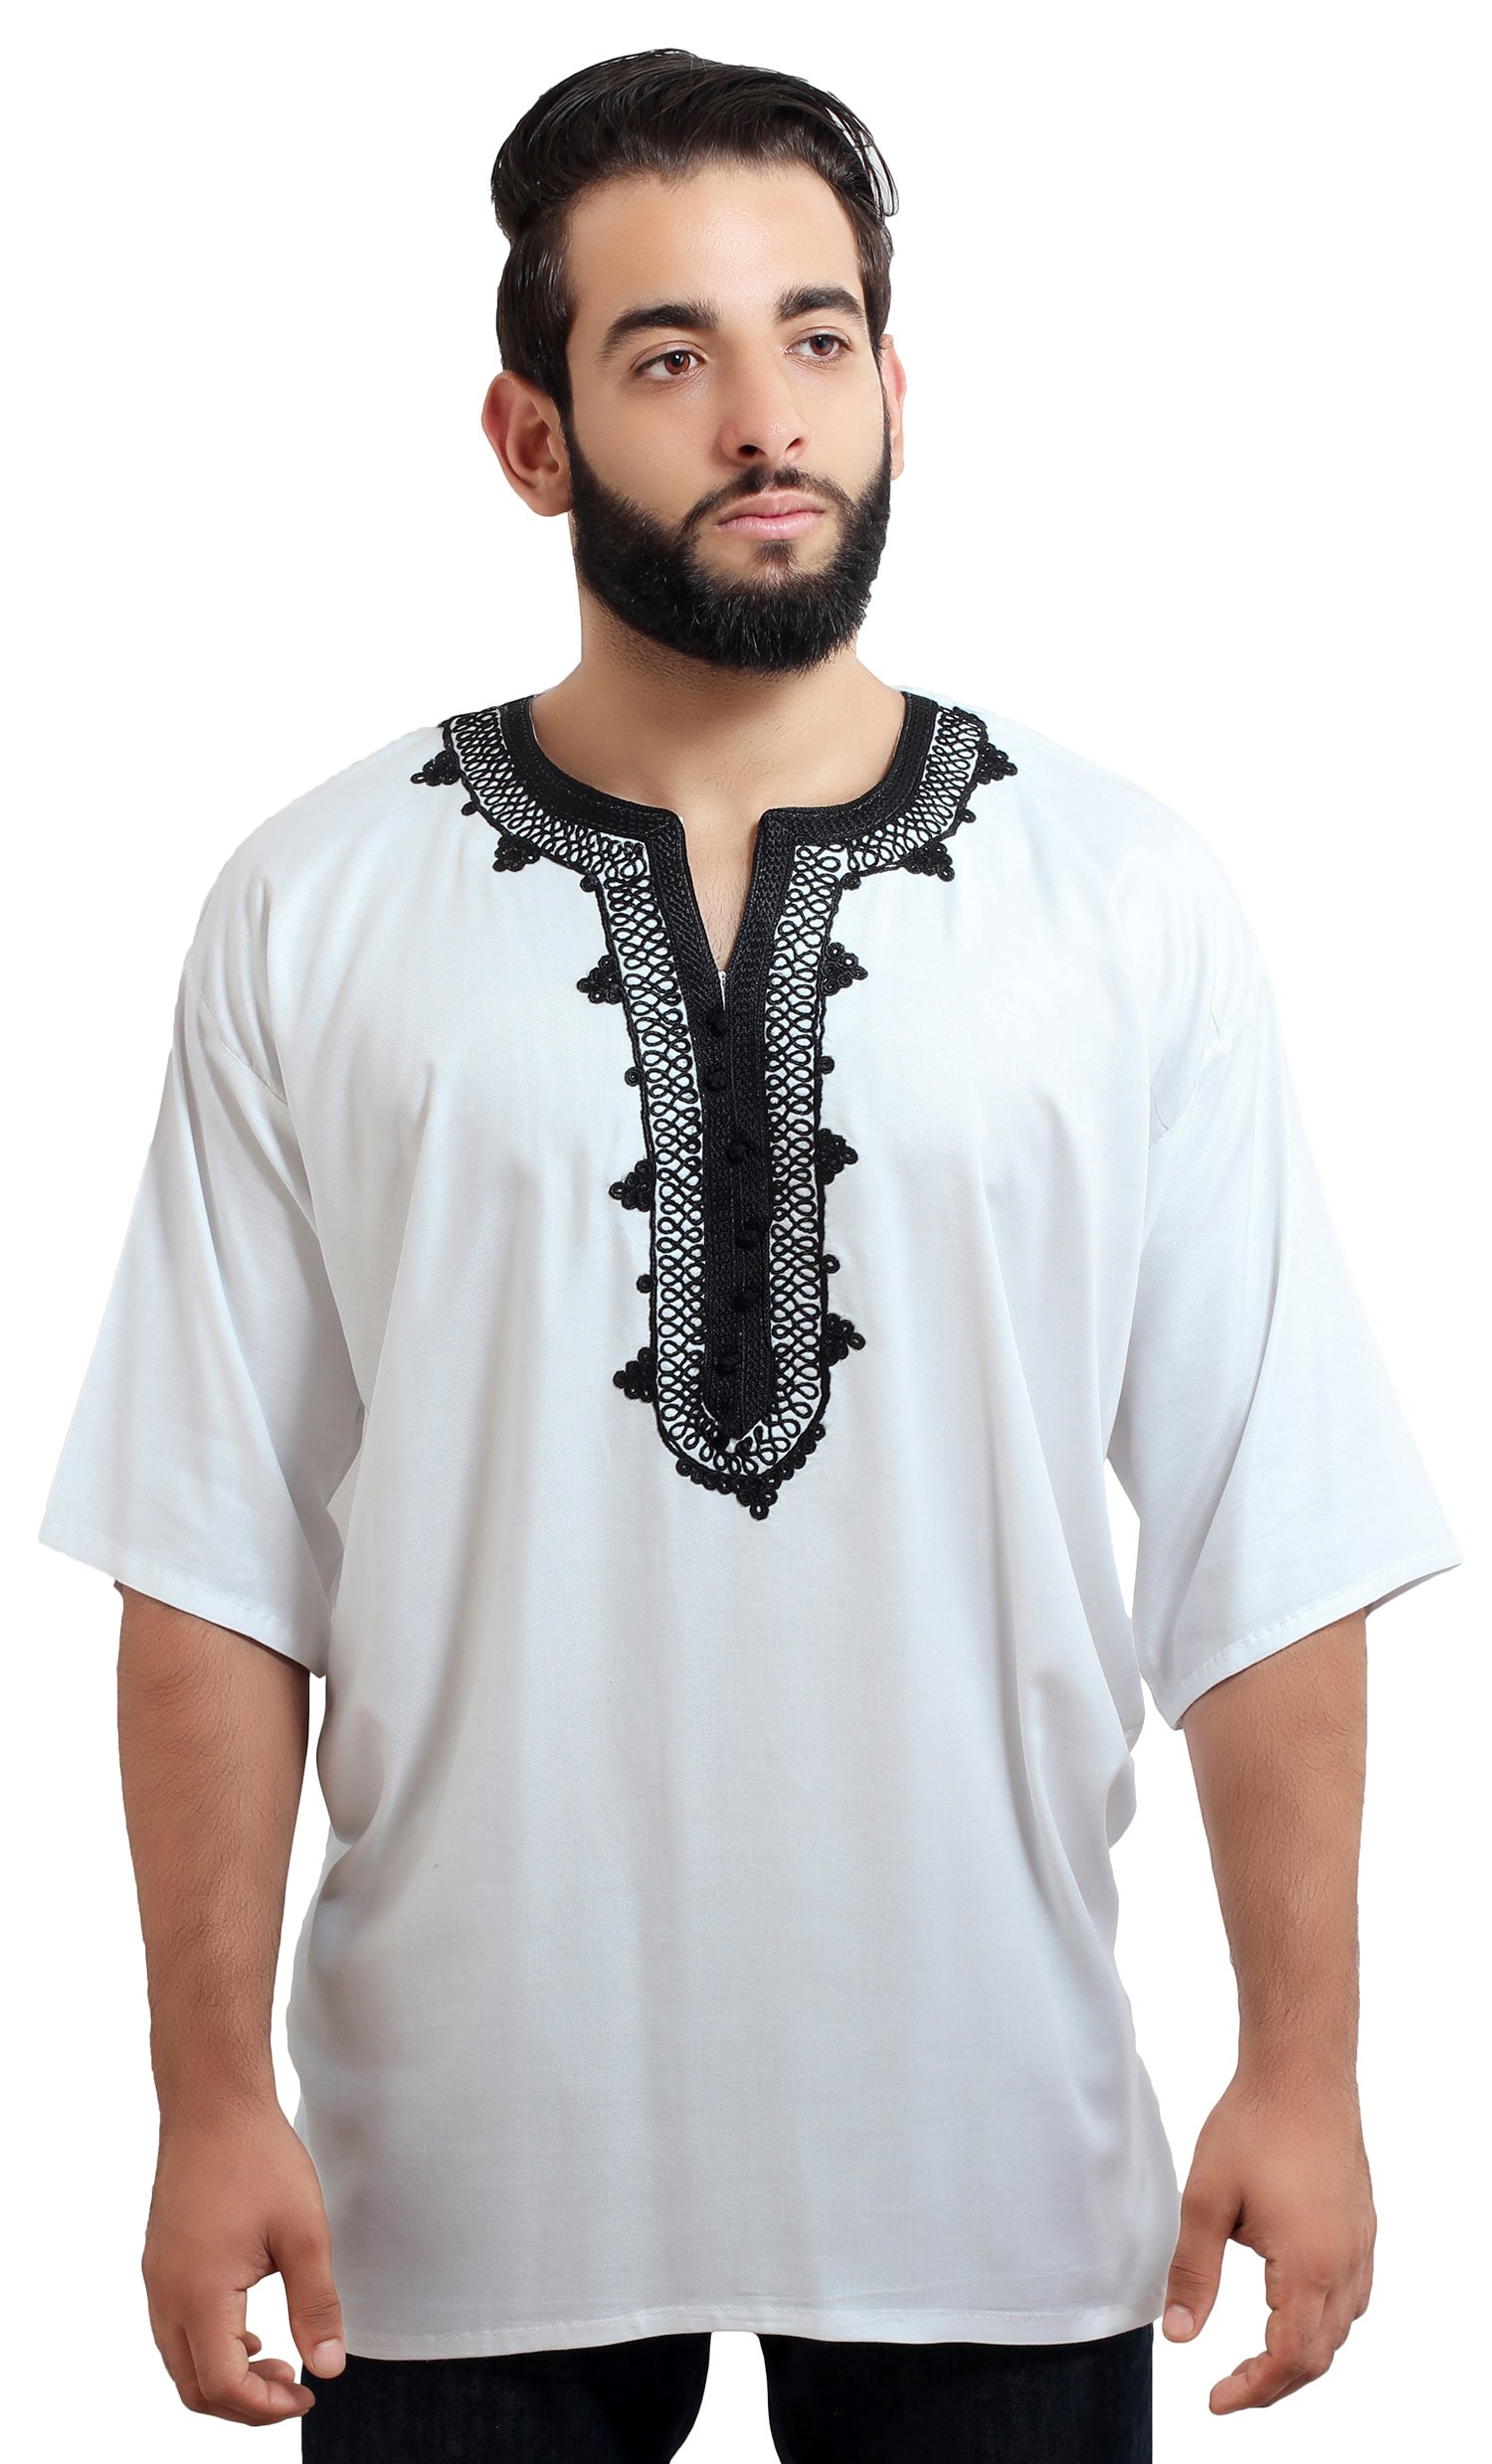 Moroccan Men Tunic Caftan Breathable Fiber Cotton Handmade Embroidery Ethnic White